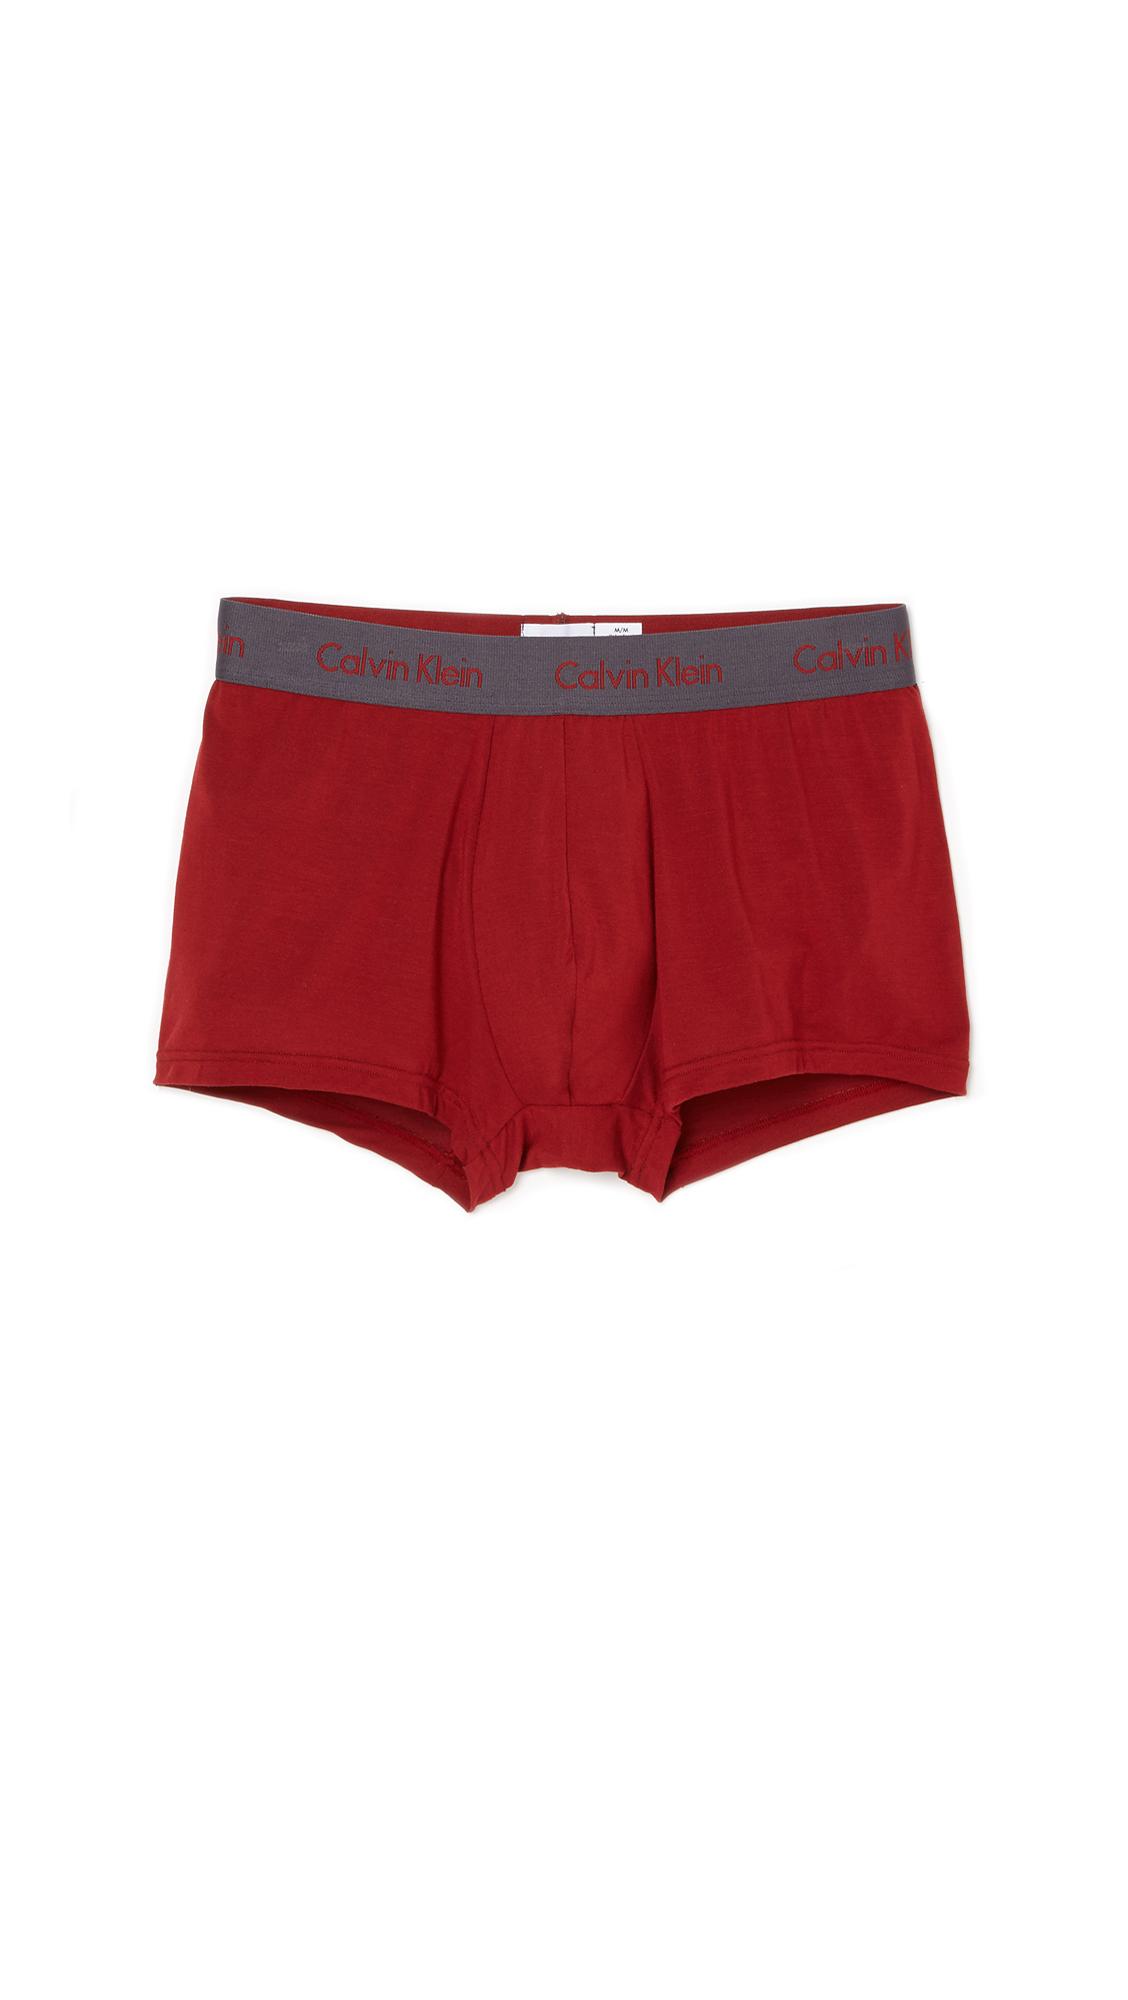 calvin klein body modal trunks in red for men vermillion. Black Bedroom Furniture Sets. Home Design Ideas